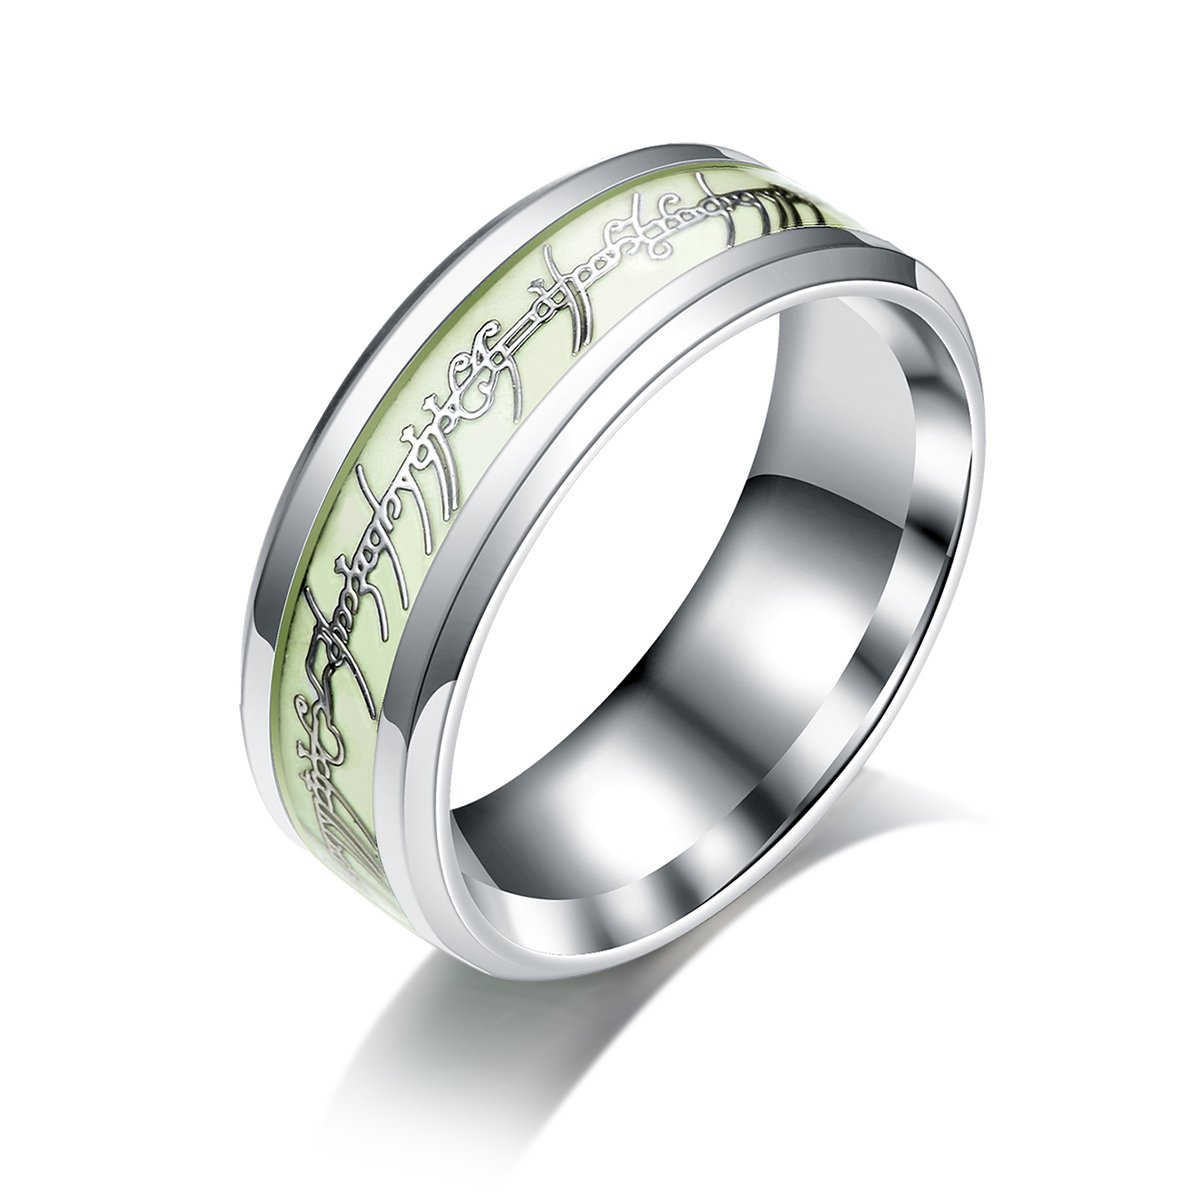 Kaiyufu Jewelers Luminous Lord Of The Ring Glow In The Dark